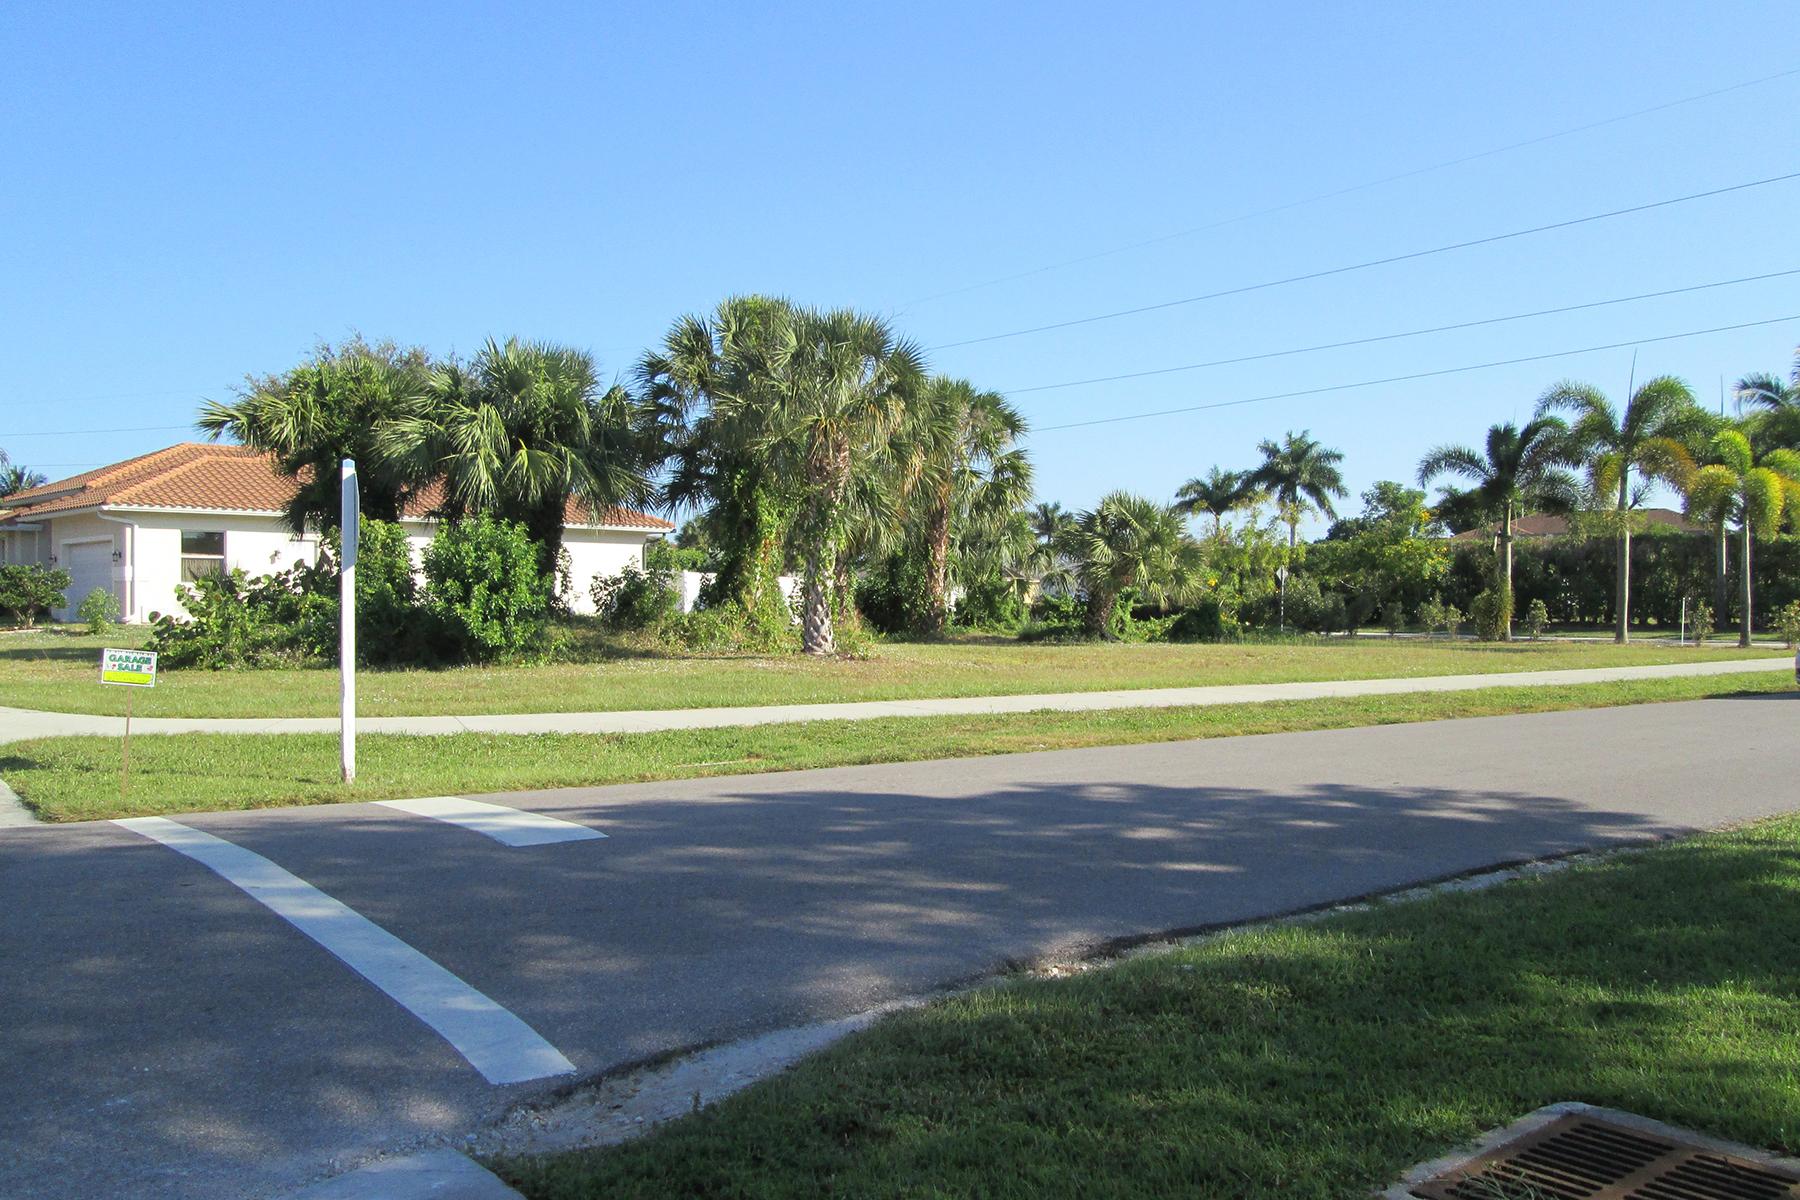 Đất đai vì Bán tại MARCO ISLAND 1310 Andalusia Marco Island, Florida, 34145 Hoa Kỳ